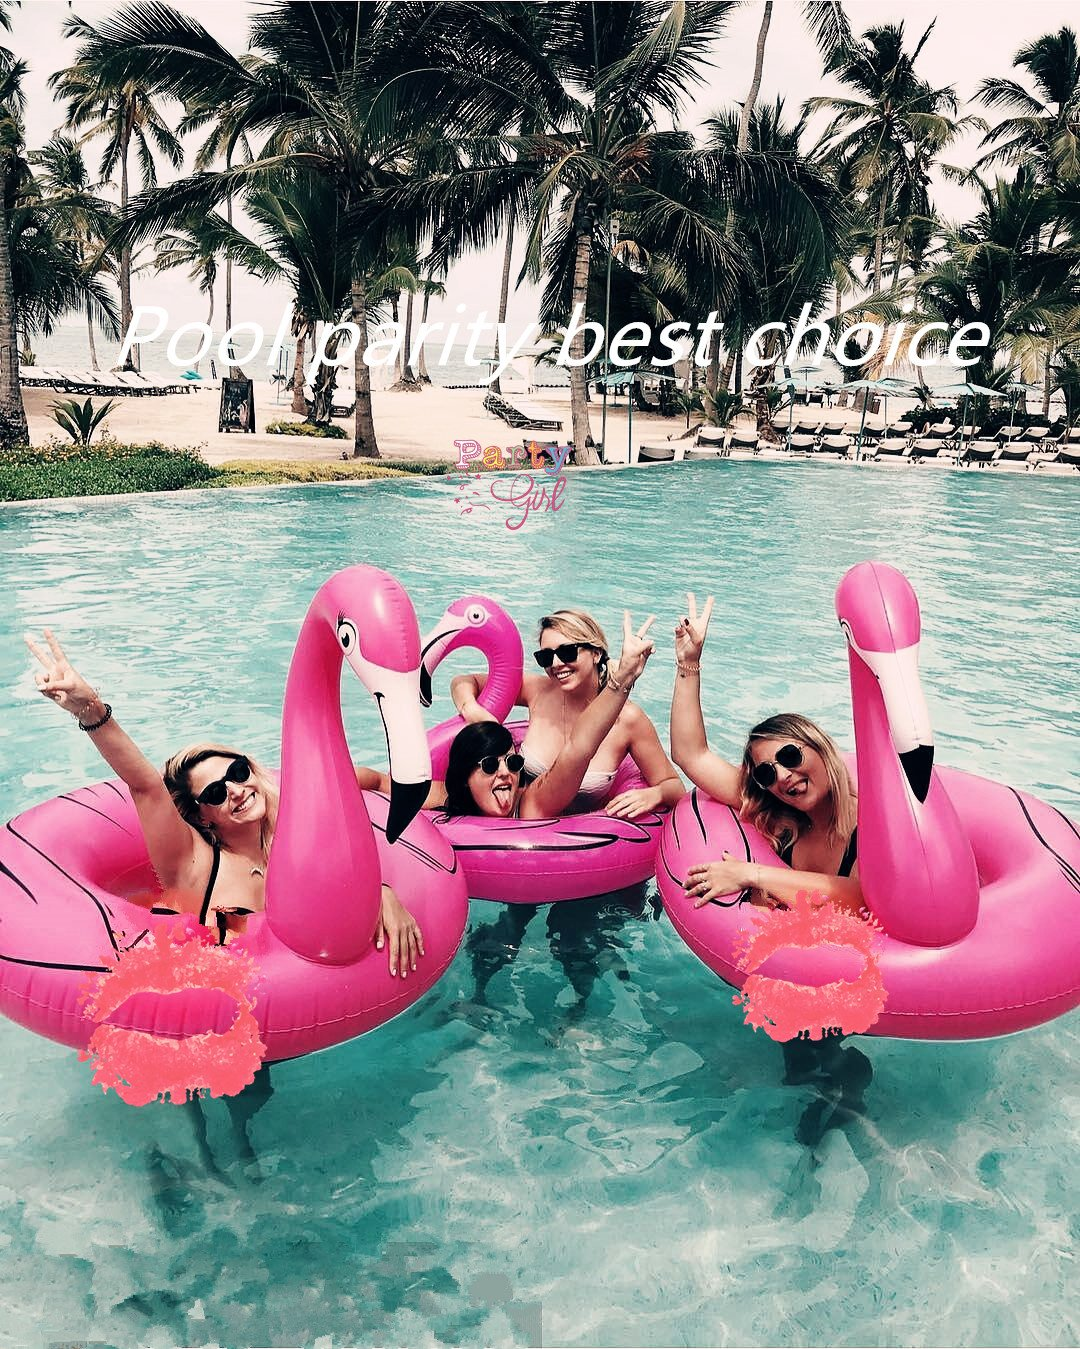 Flamenco Hinchable colchonetas piscina Flotador Gigante de 120cm Flamenco para Piscina, Juguete Veraniego Inflable, Juguete para Fiestas de Piscina con ...